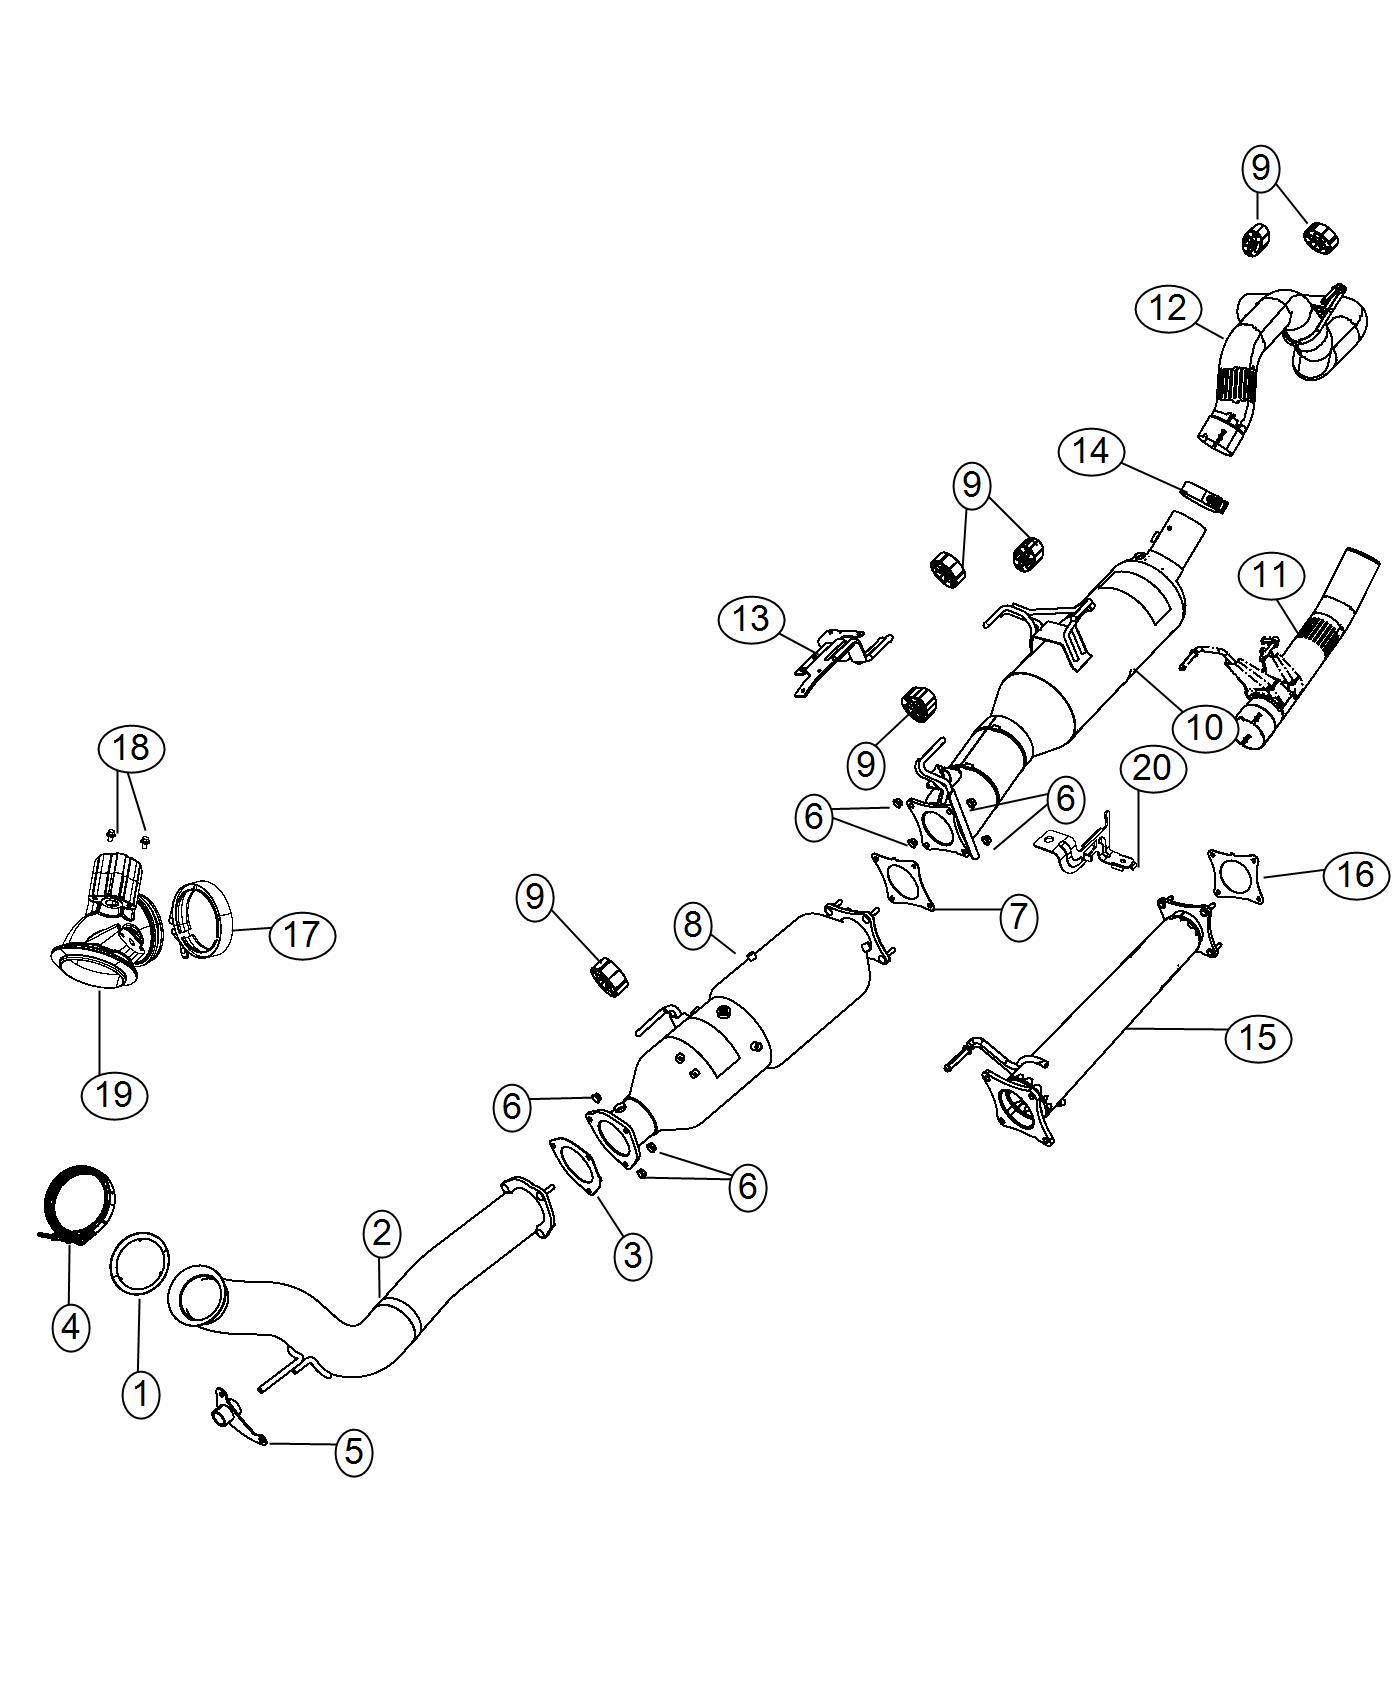 Ram Converter Catalytic Scr With Ammonia Trap